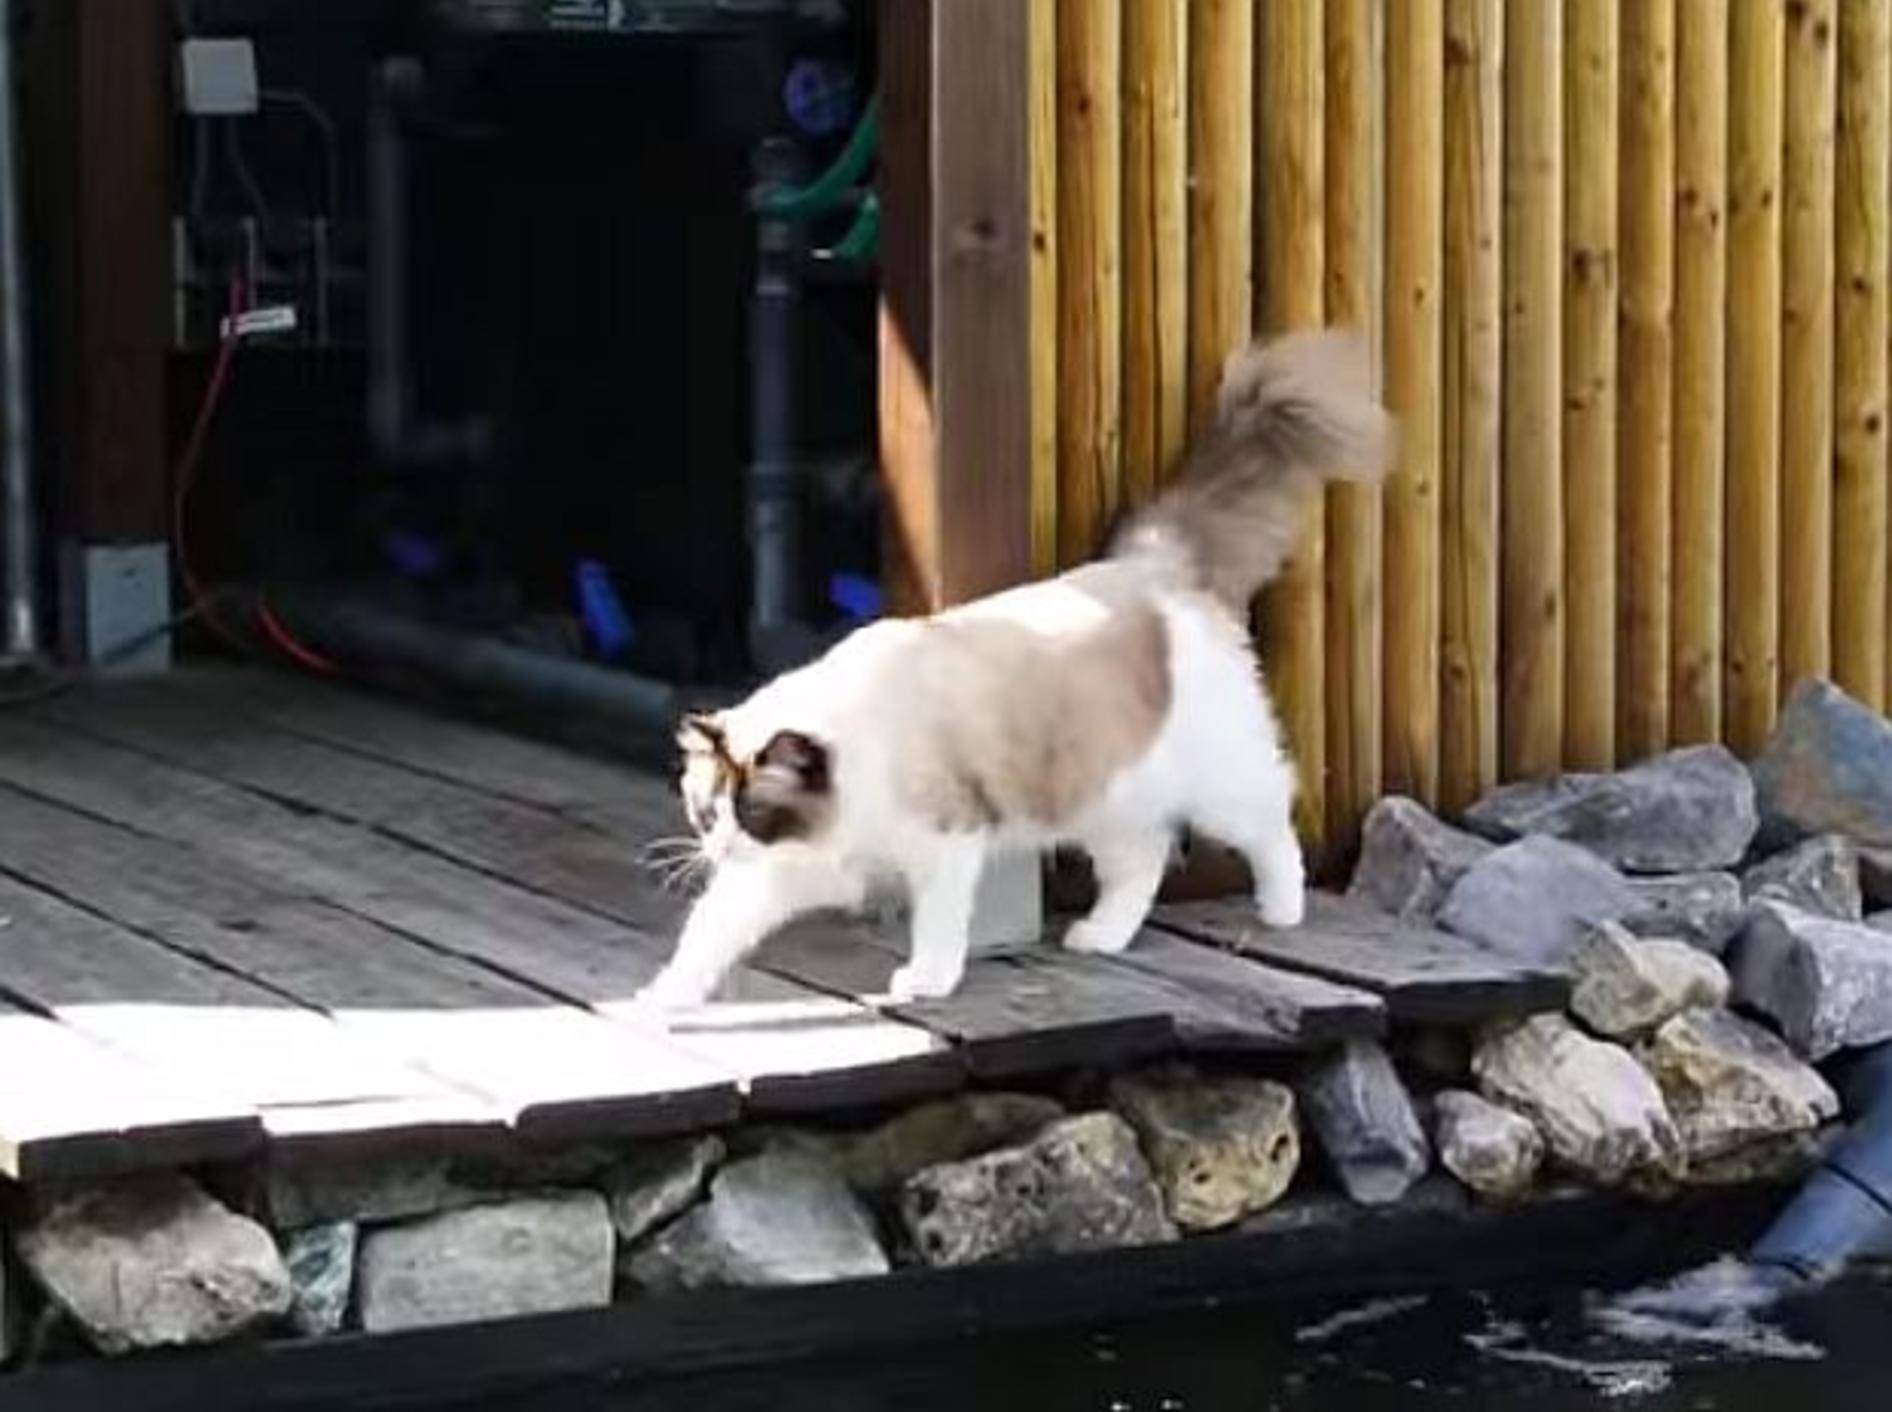 Katzenausflug zum Fischteich – Bild: Youtube / Xiedubbel